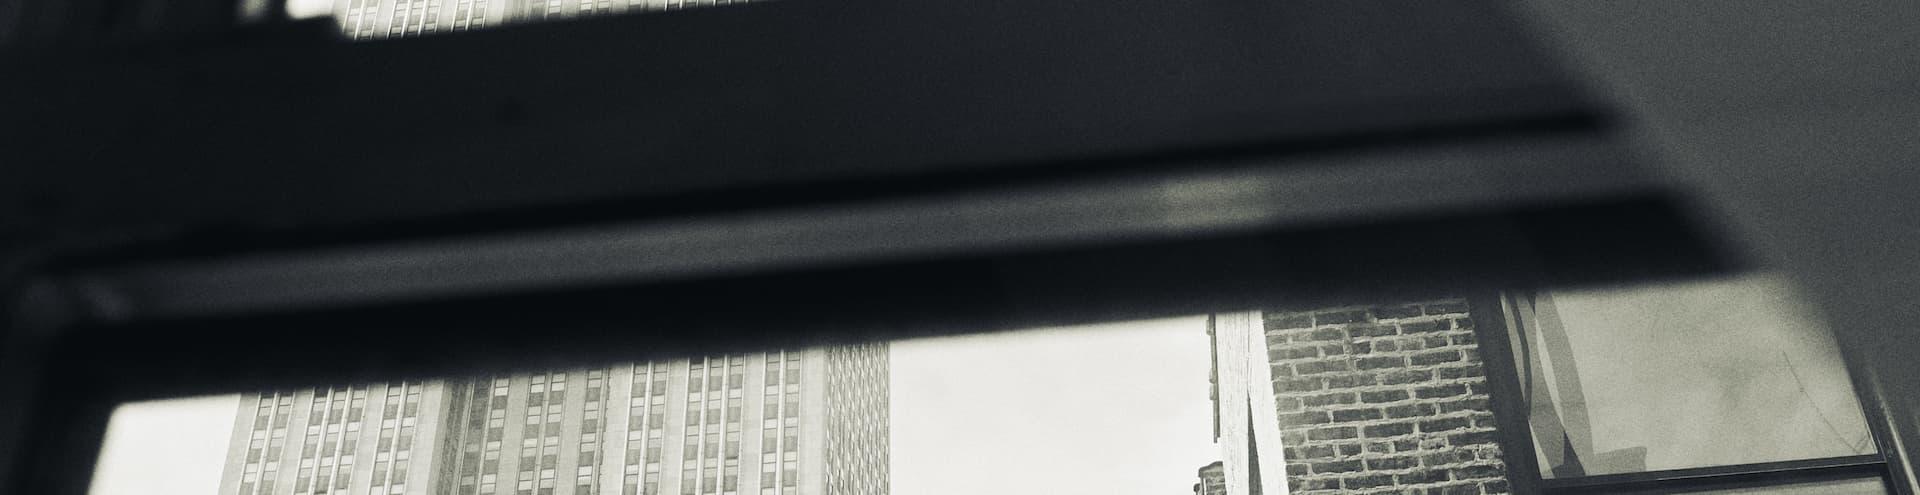 Panorama d'un immeuble.